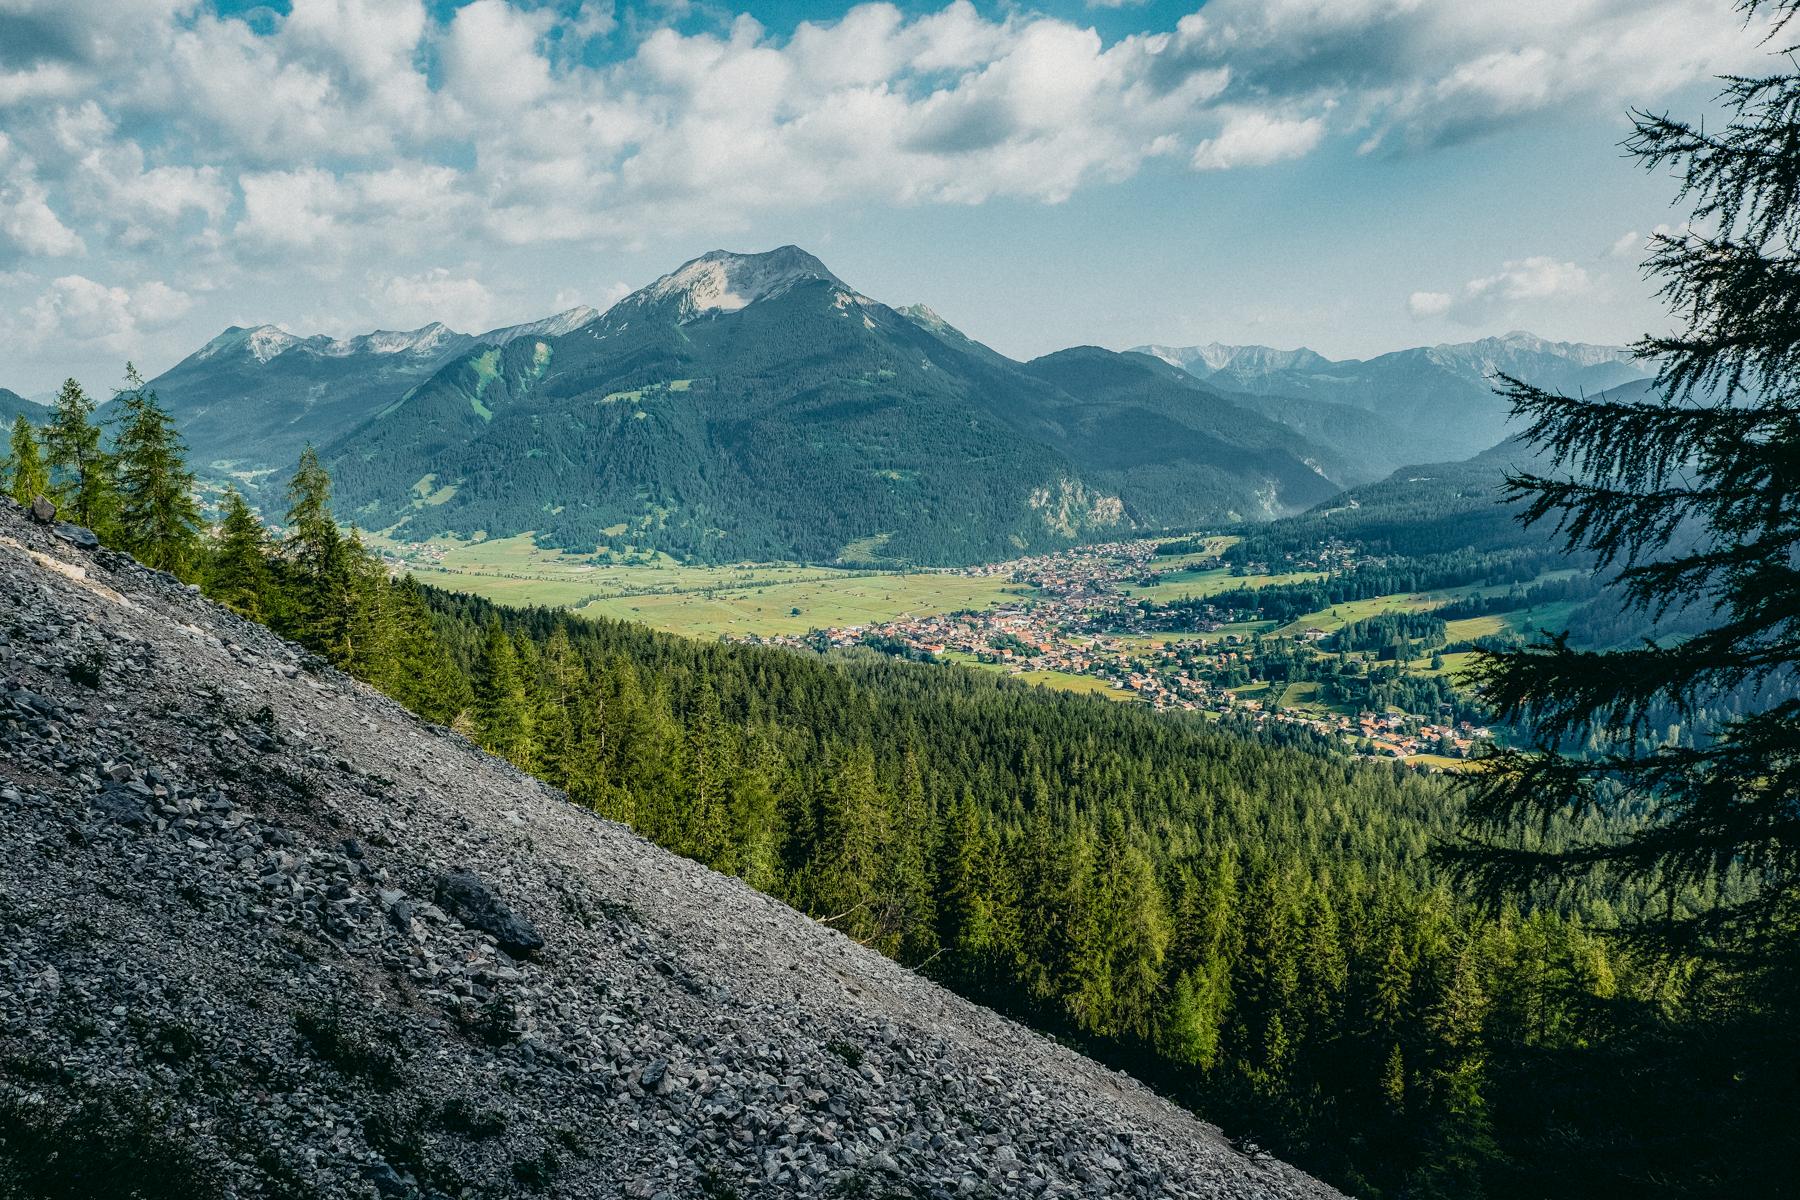 Geheimtipp Muenchen Indieberge Welloutside Drachenkopf 3 – ©Well Outside